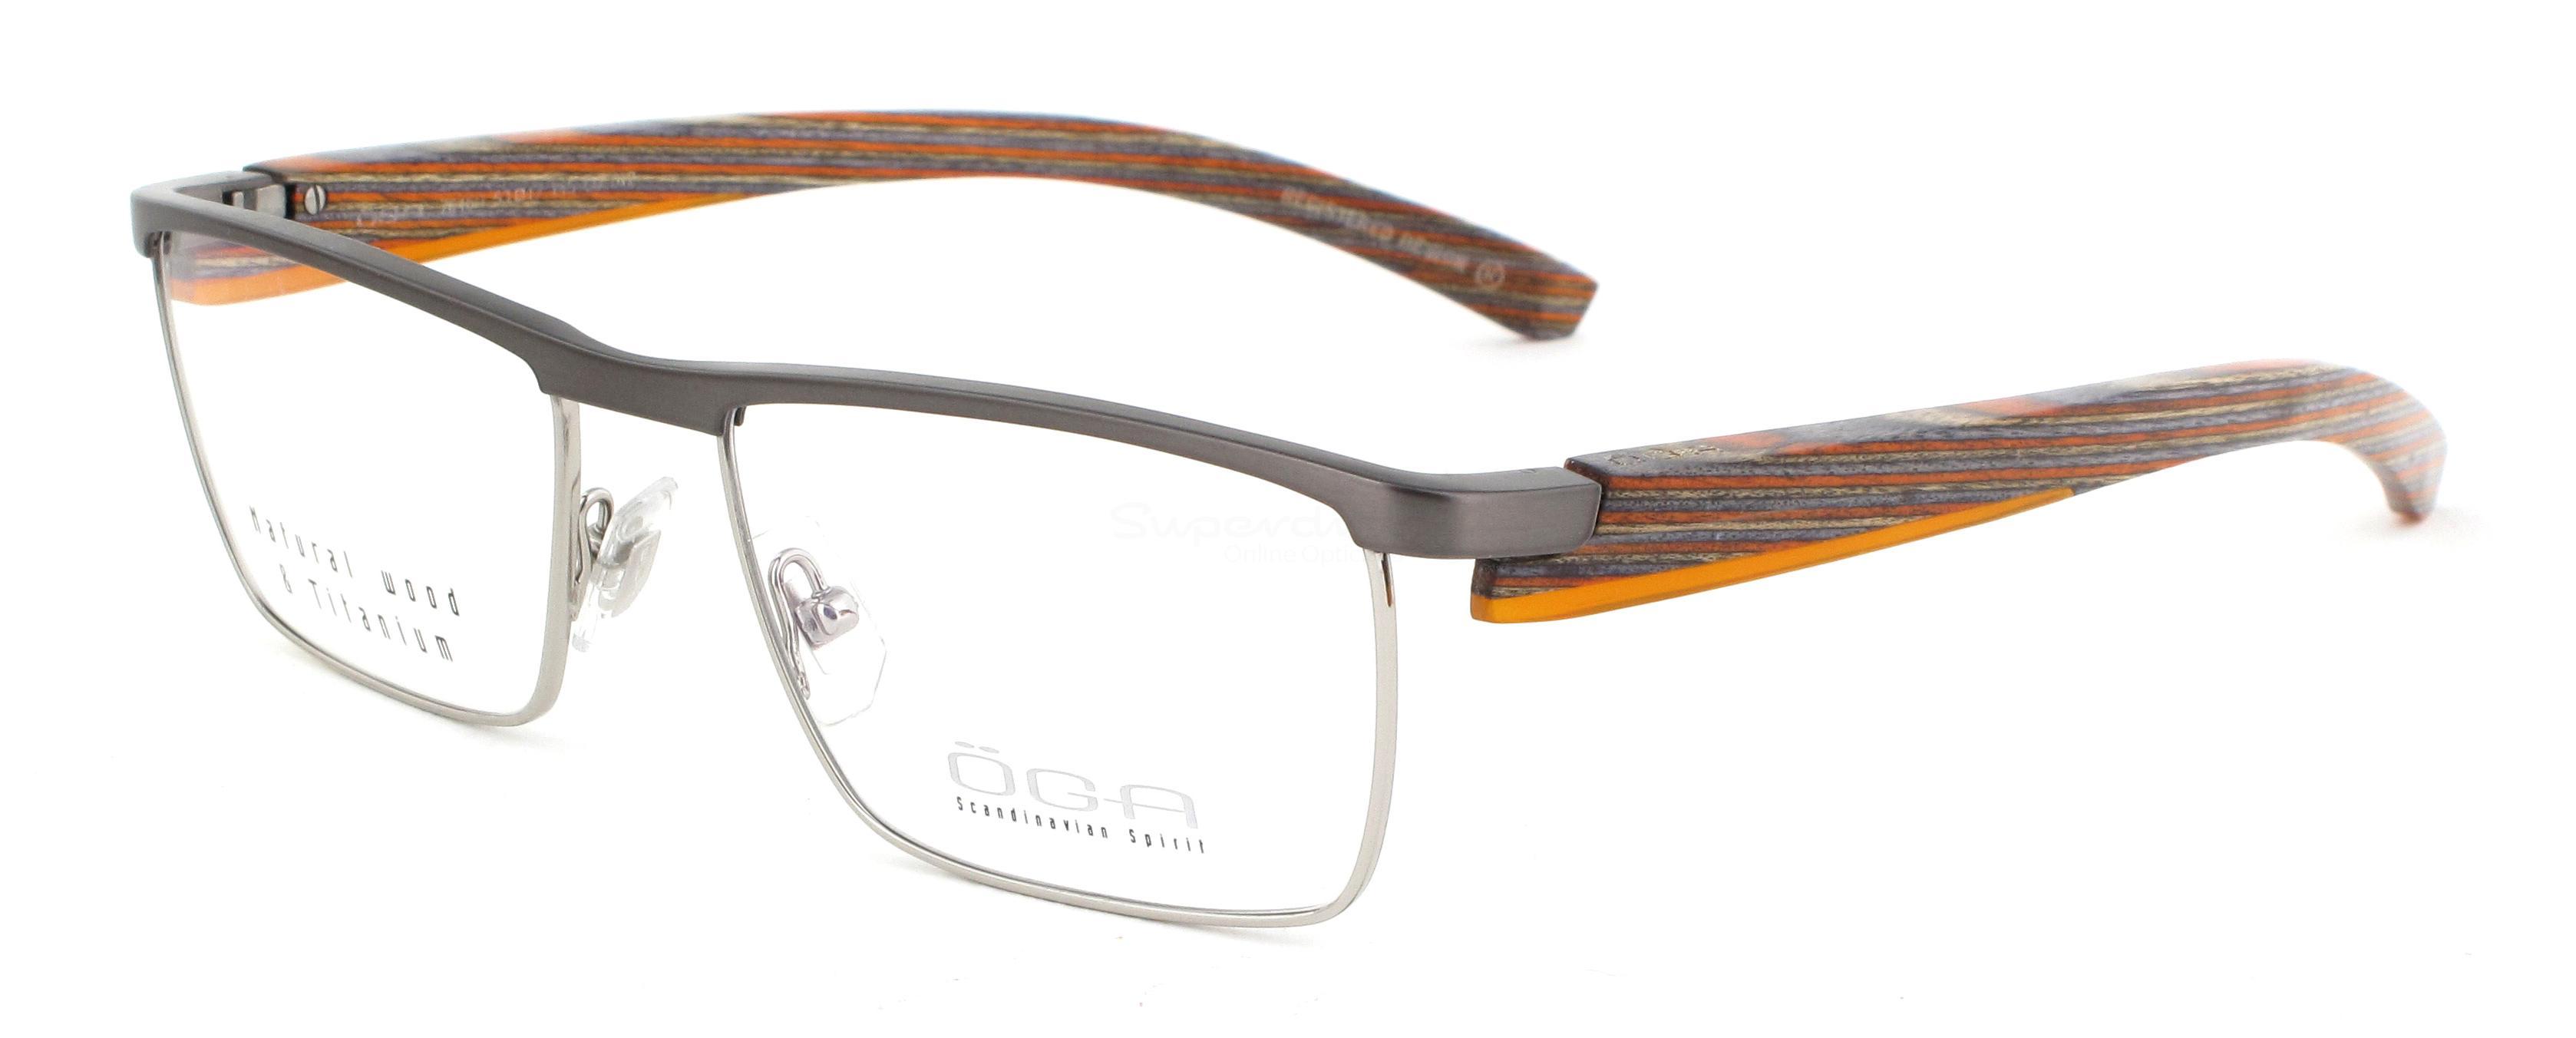 GO012 7646O T TRAC (WOOD) Glasses, ÖGA Scandinavian Spirit